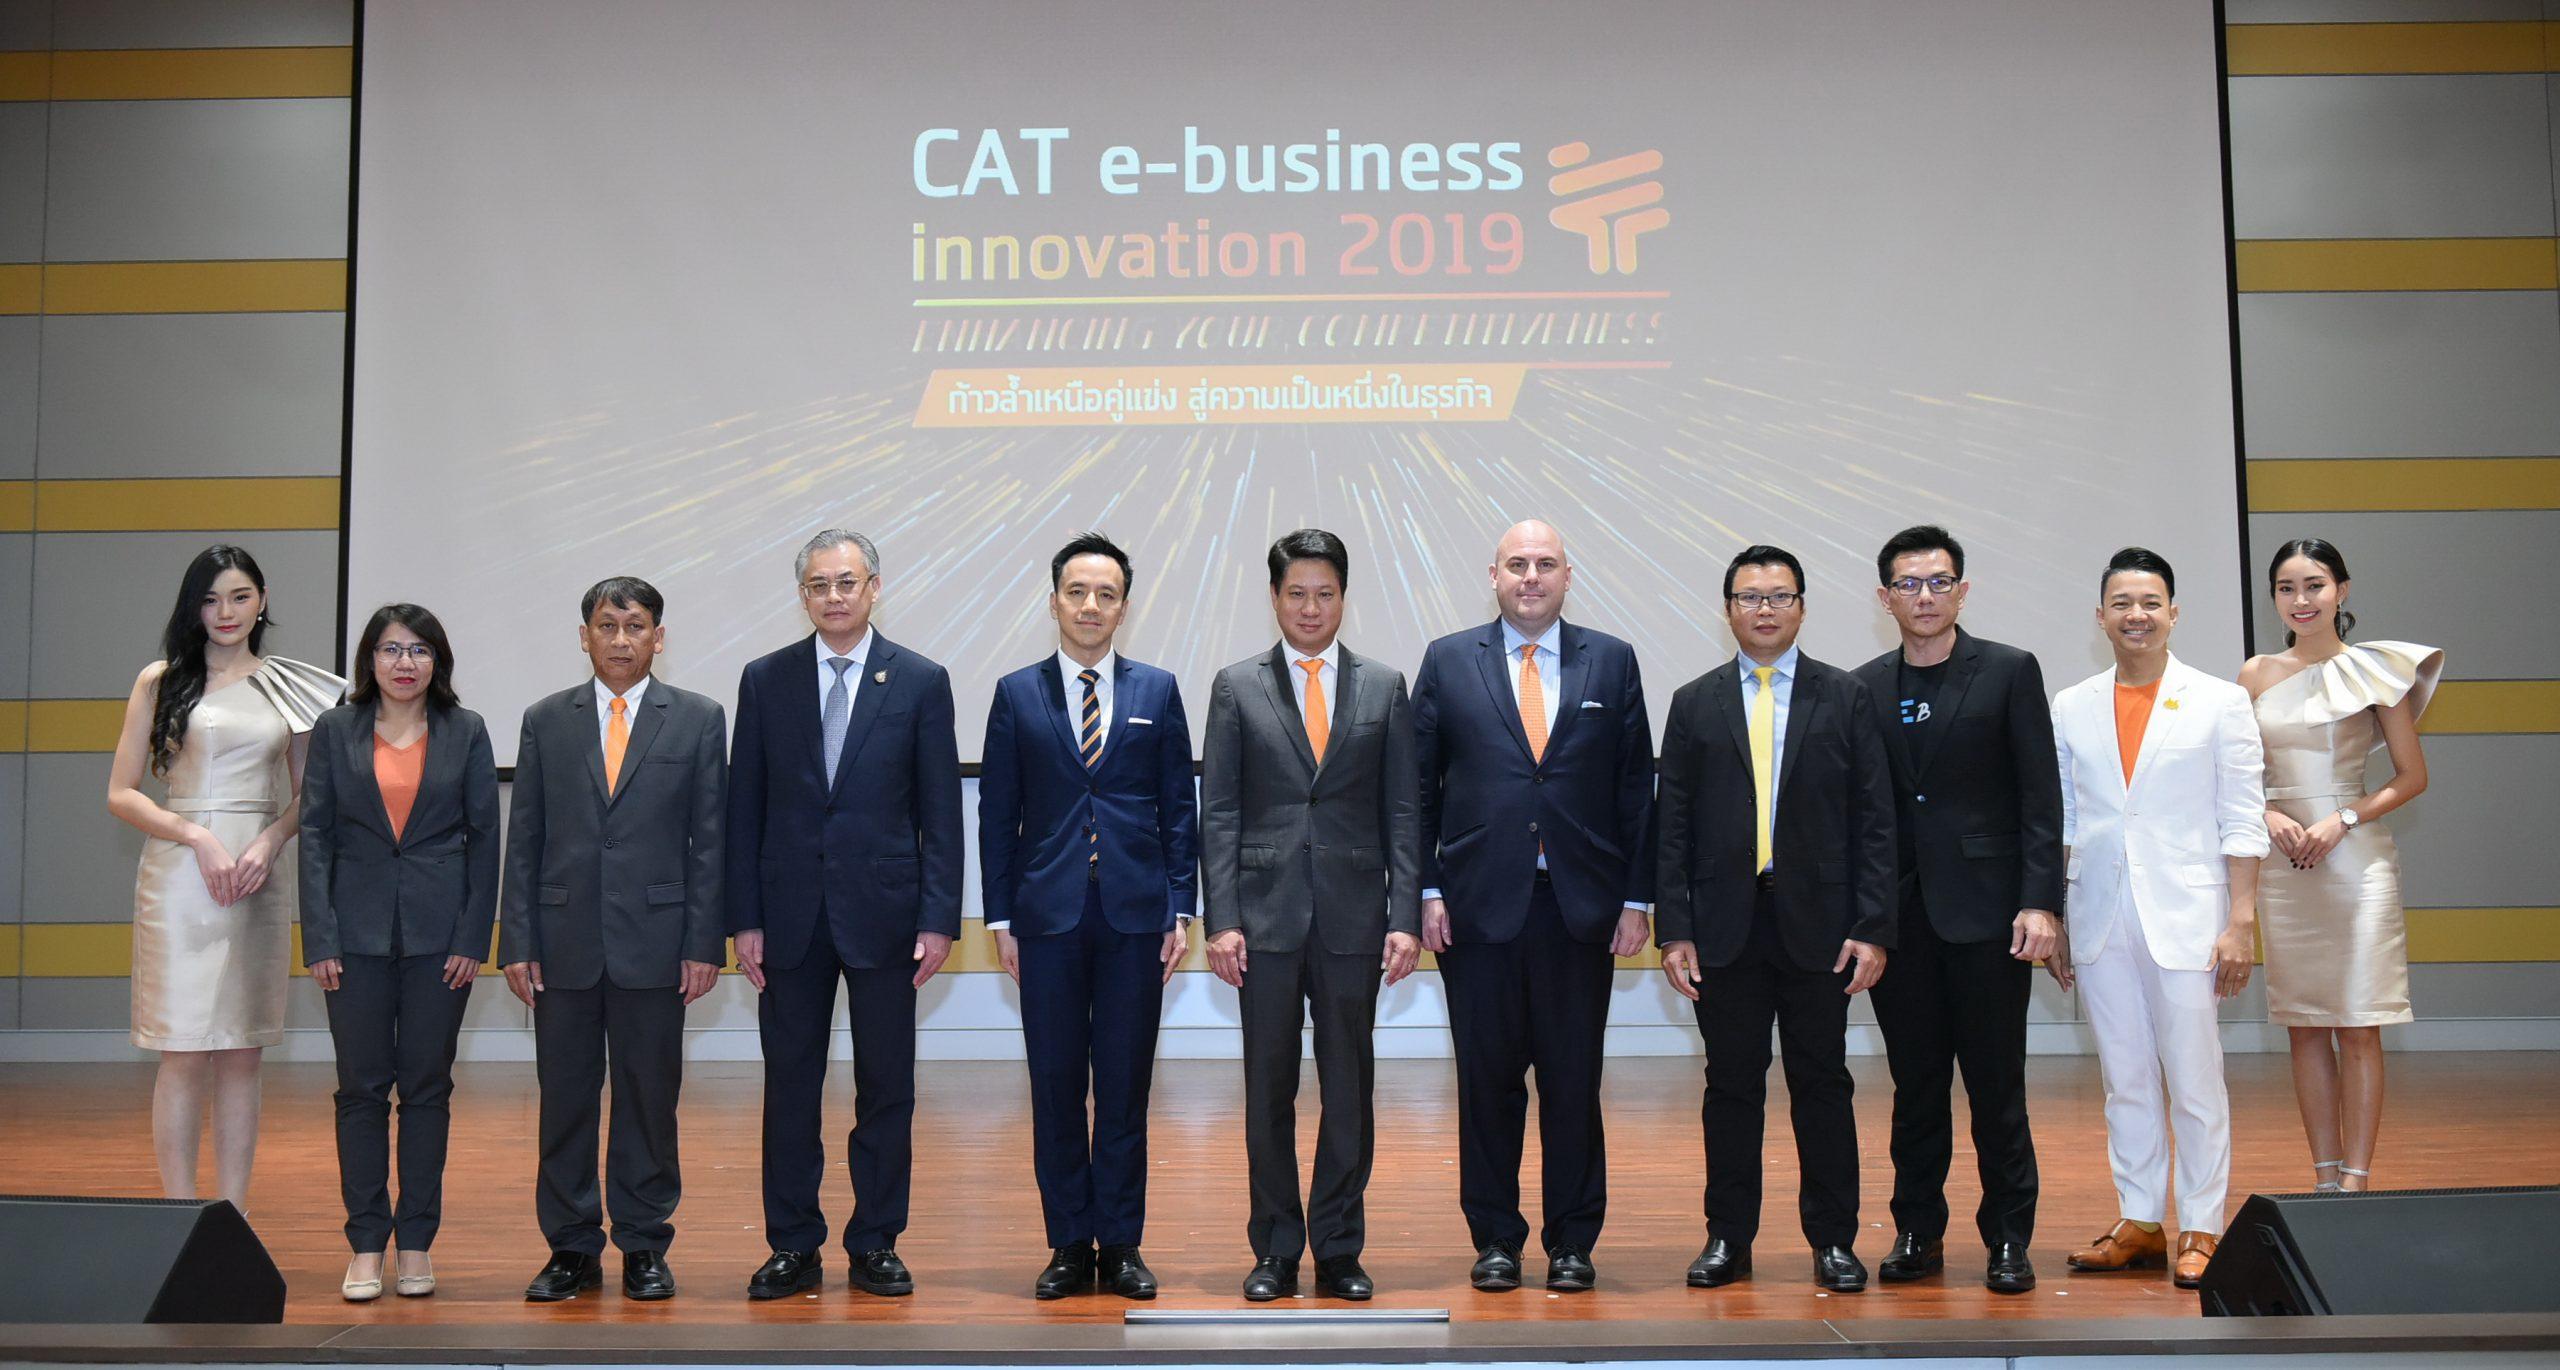 CAT e-business Innovations 2019